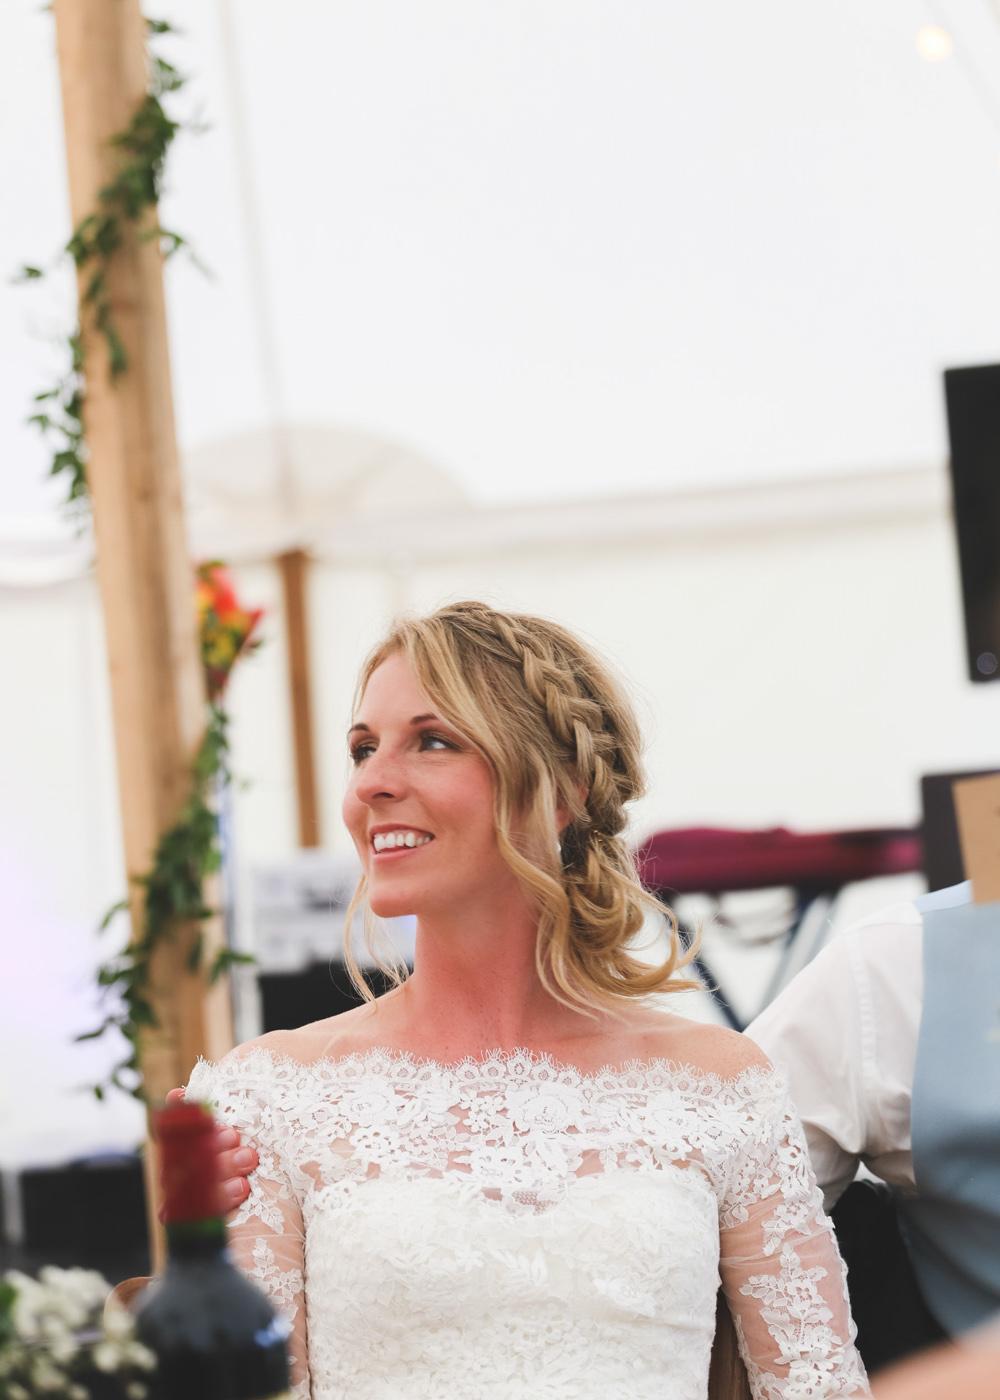 Bride Bridal Hair Style Up Do Plait Braid Make Up Airbnb Wedding Pickavance Weddings